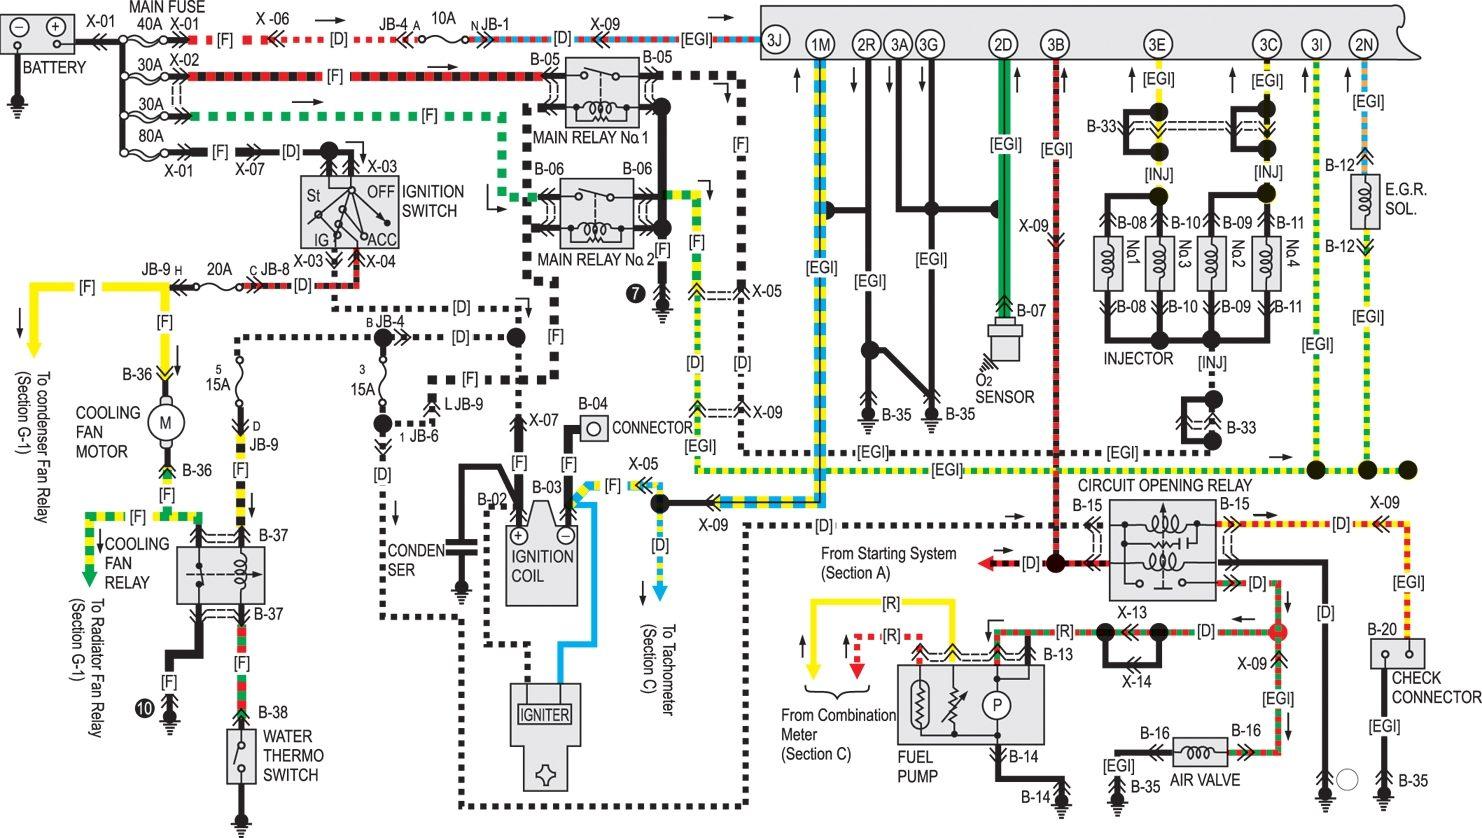 medium resolution of 1992 mazda b2200 alternator wiring diagram 87 mazda b2200 ignition wiring diagram wiring diagrams